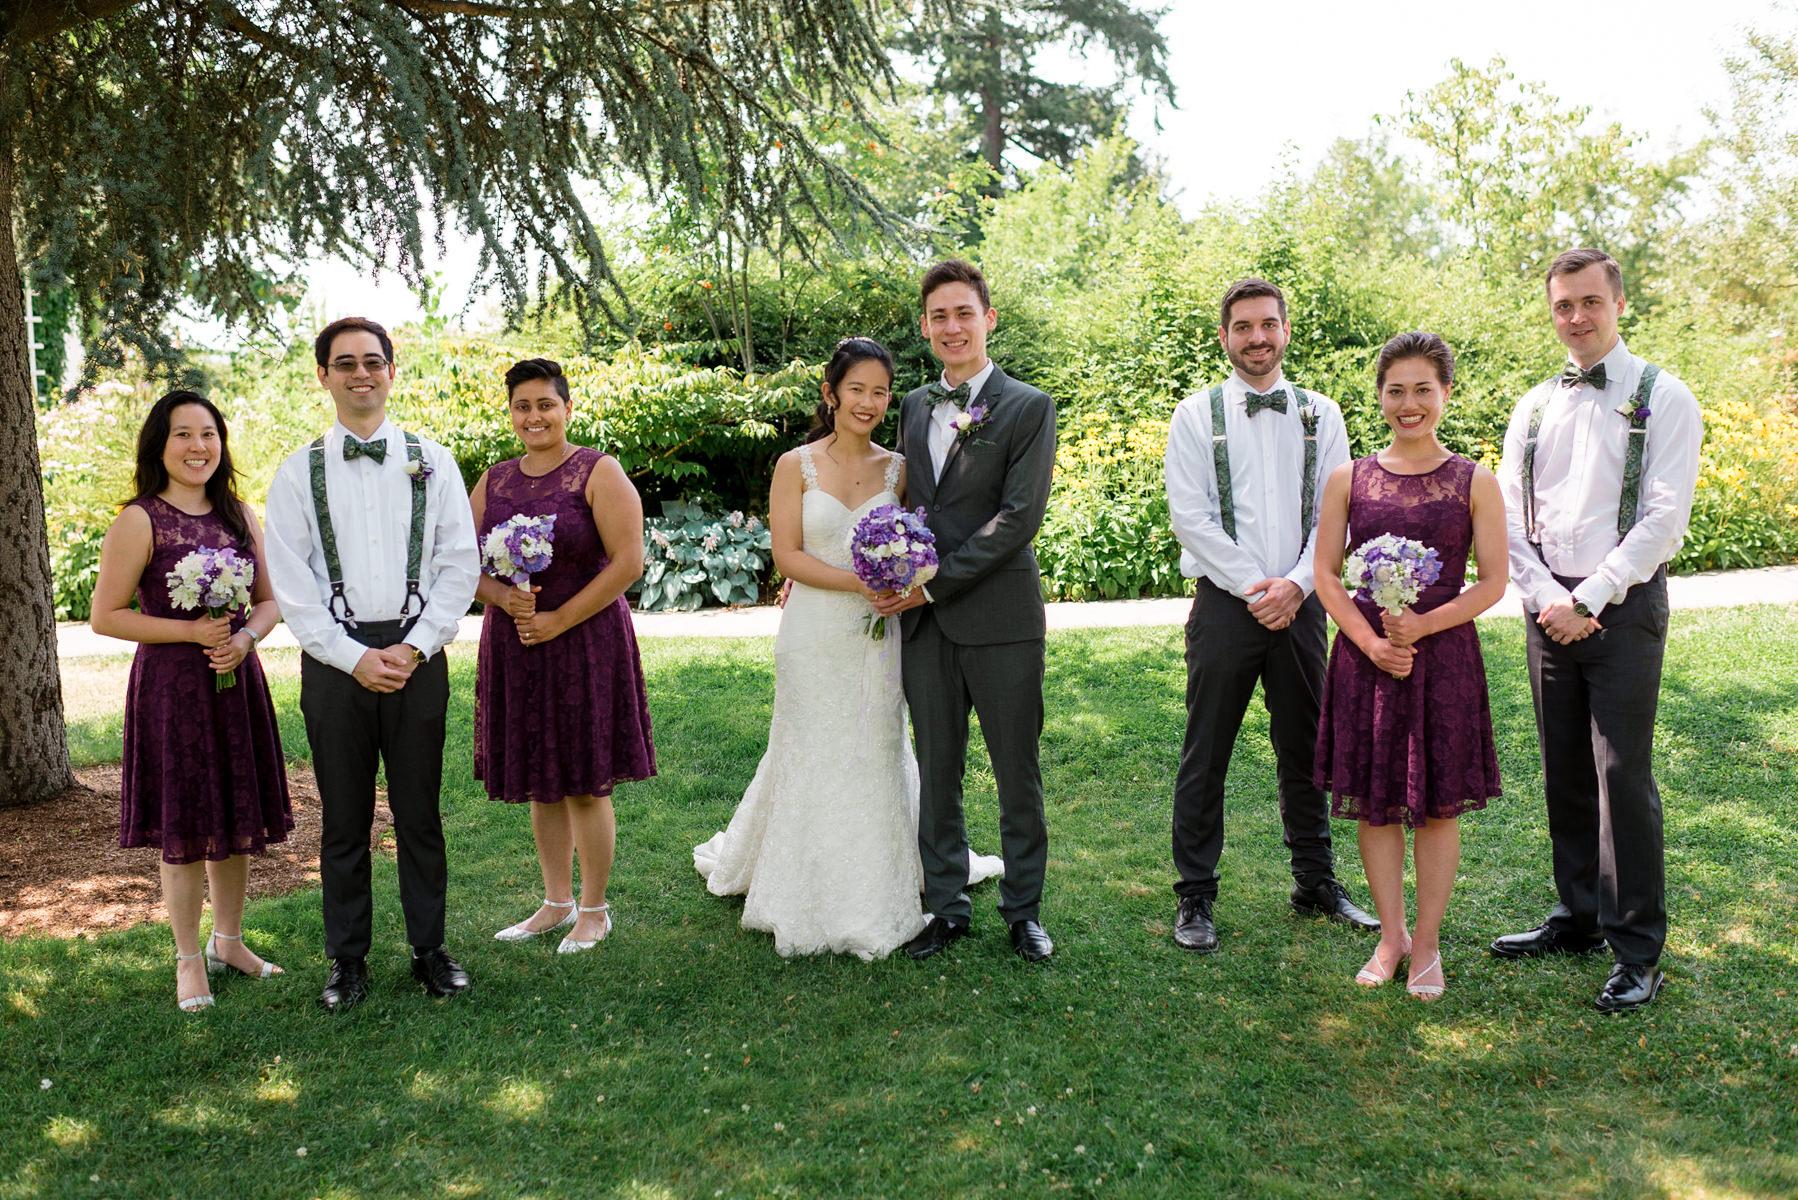 Andrew Tat - Documentary Wedding Photography - Heritage Hall - Kirkland, Washington - Grace & James - 09.JPG